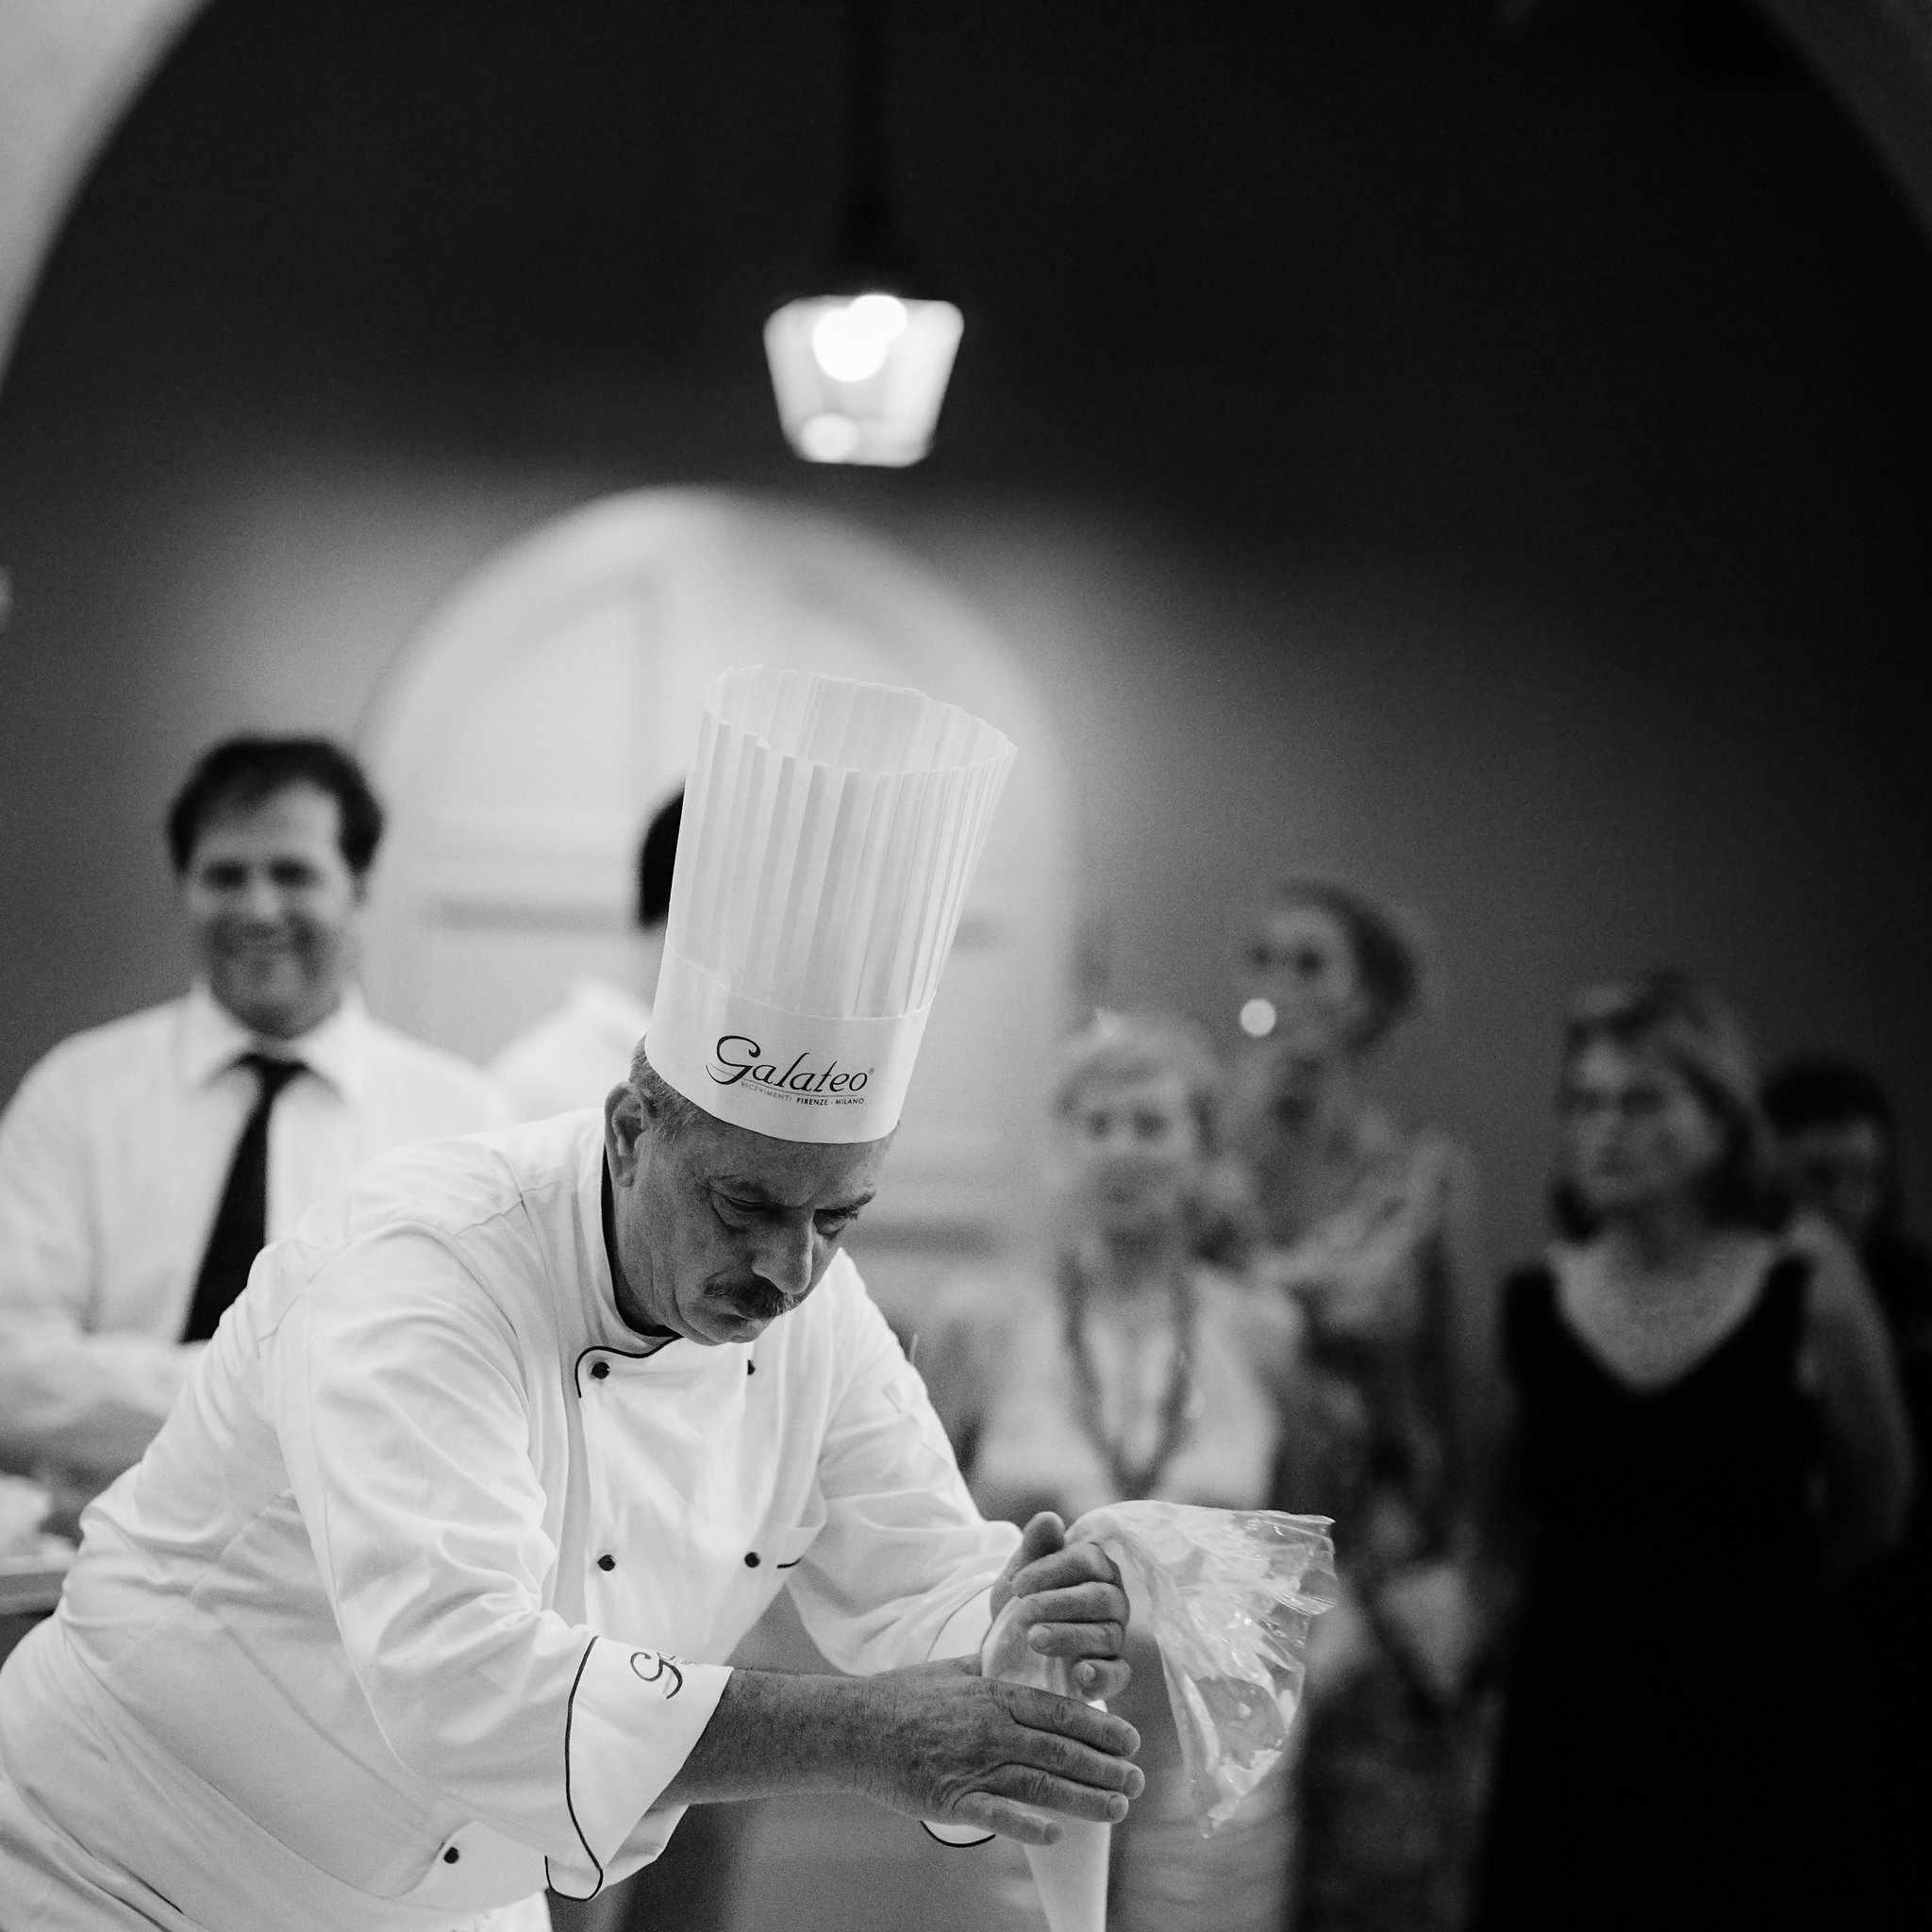 Chef making wedding cake